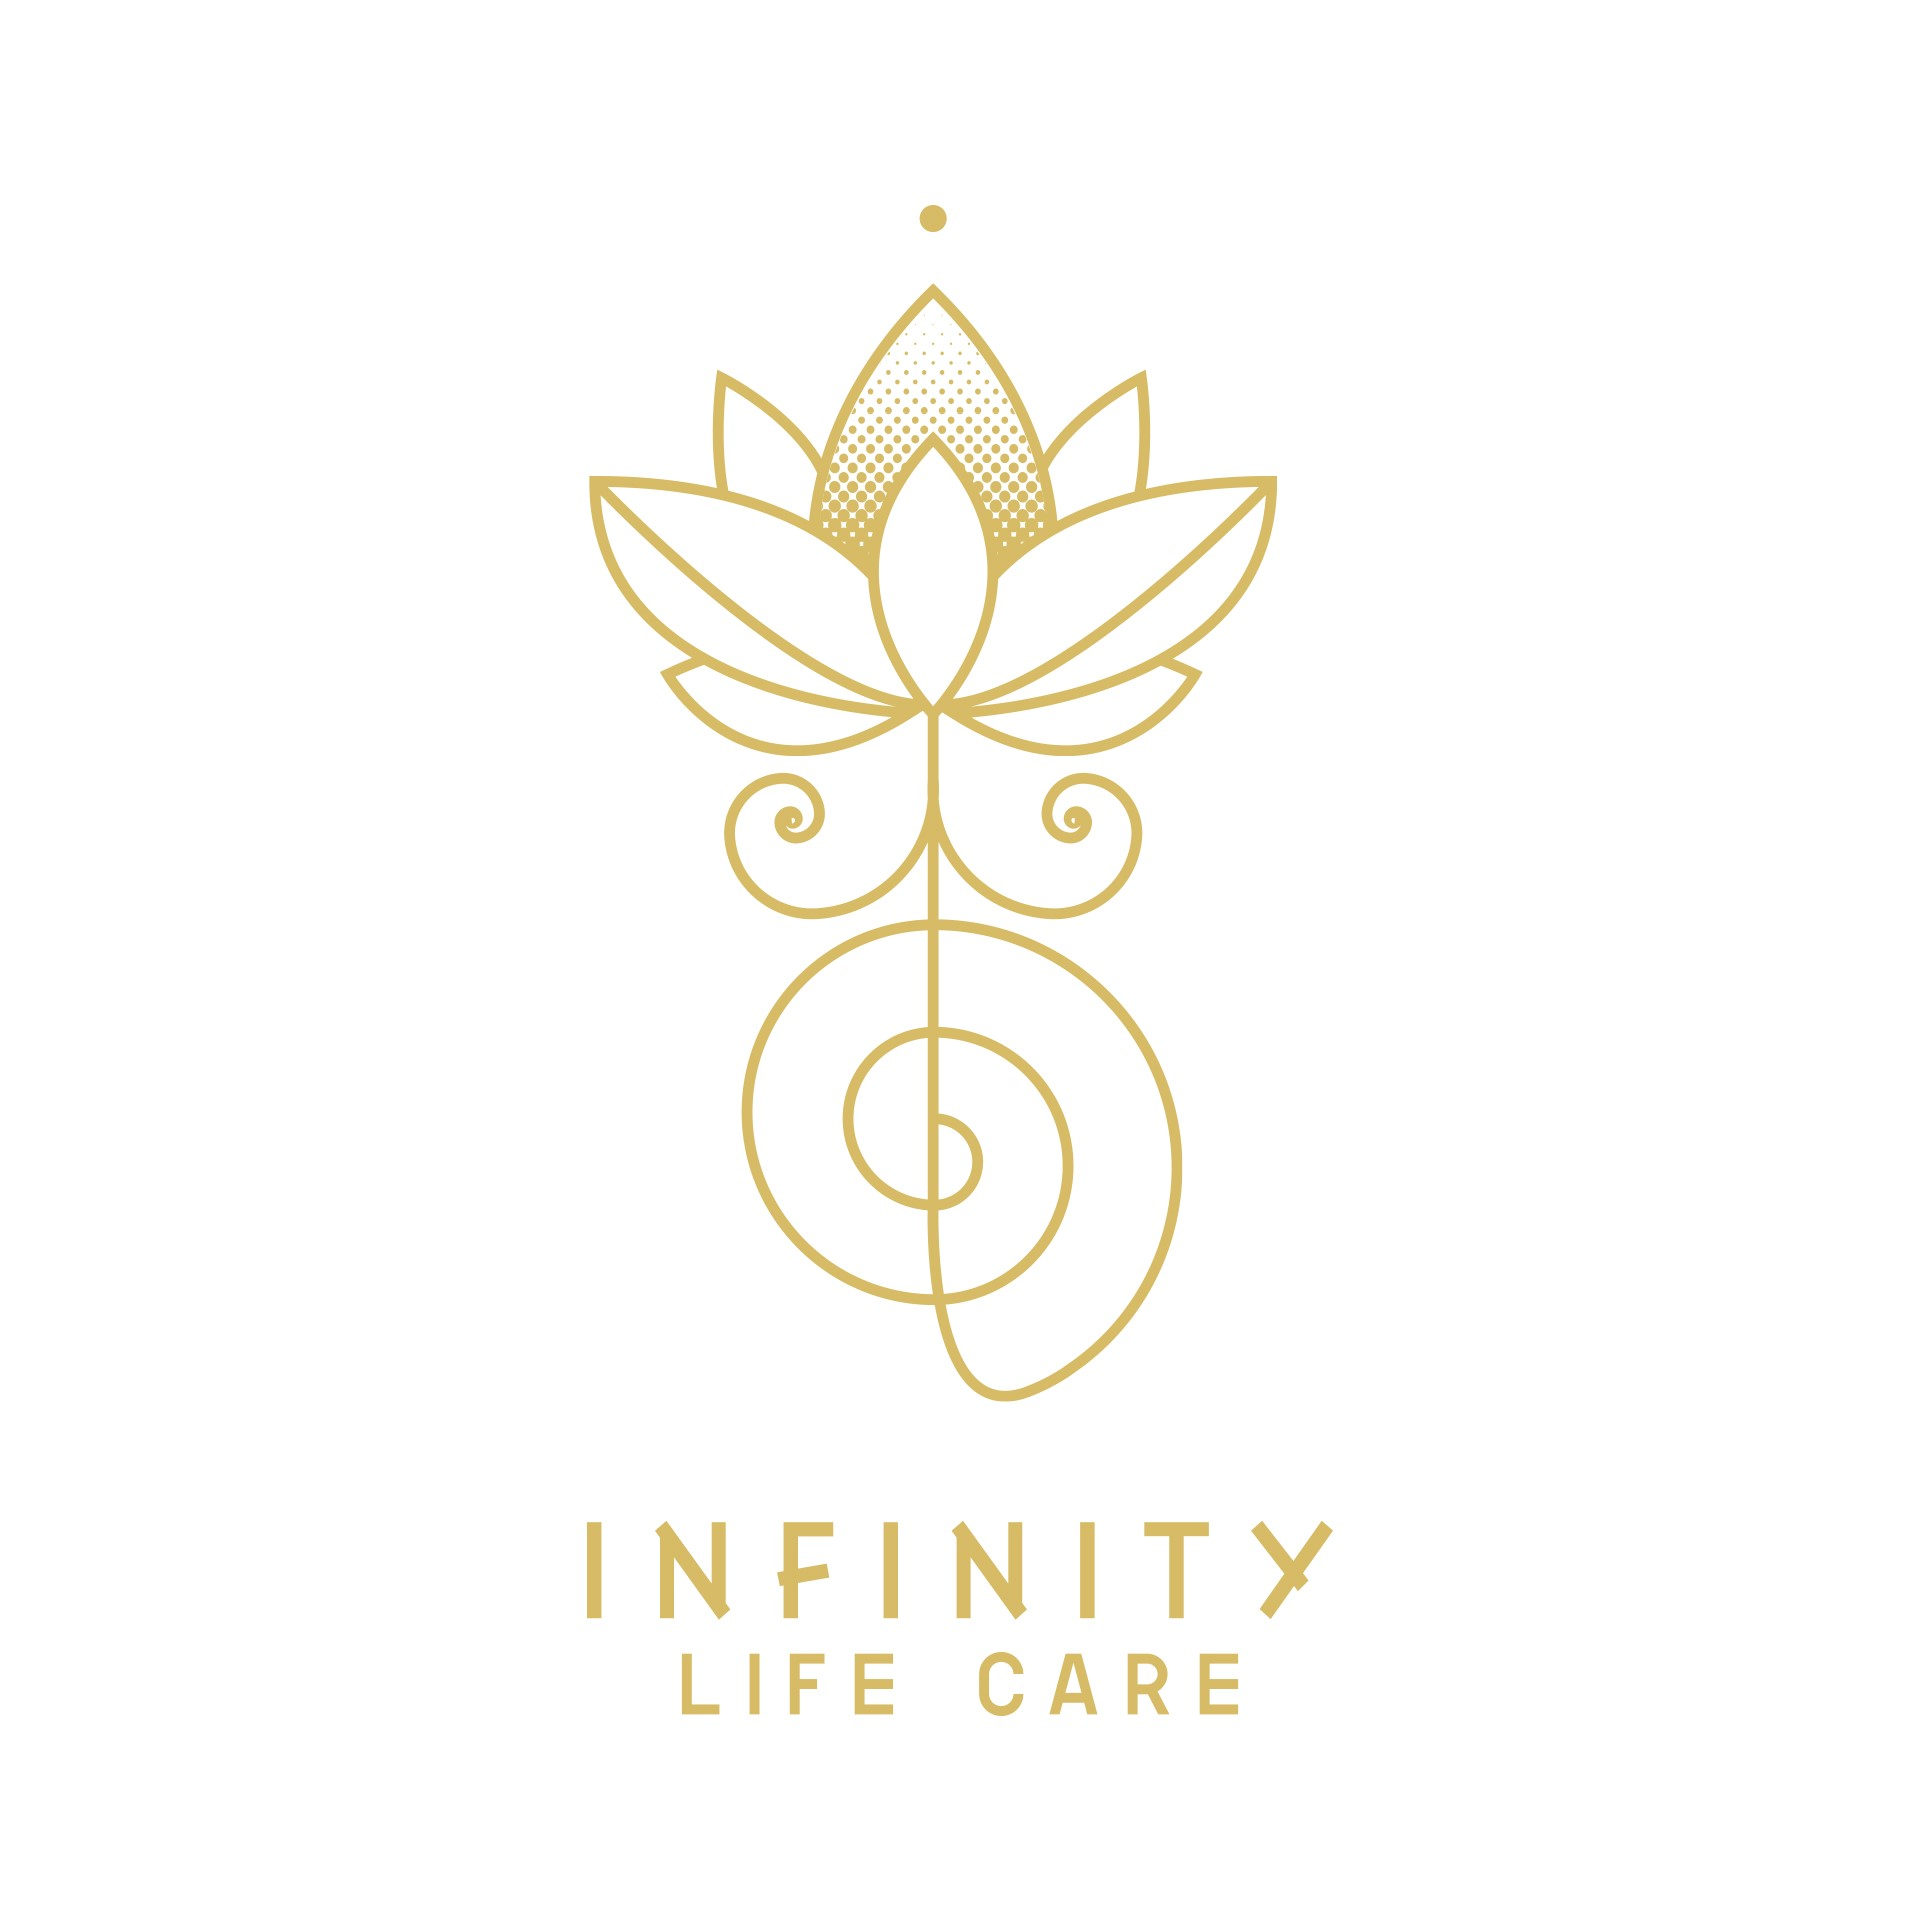 INFINITY LIFE CARE